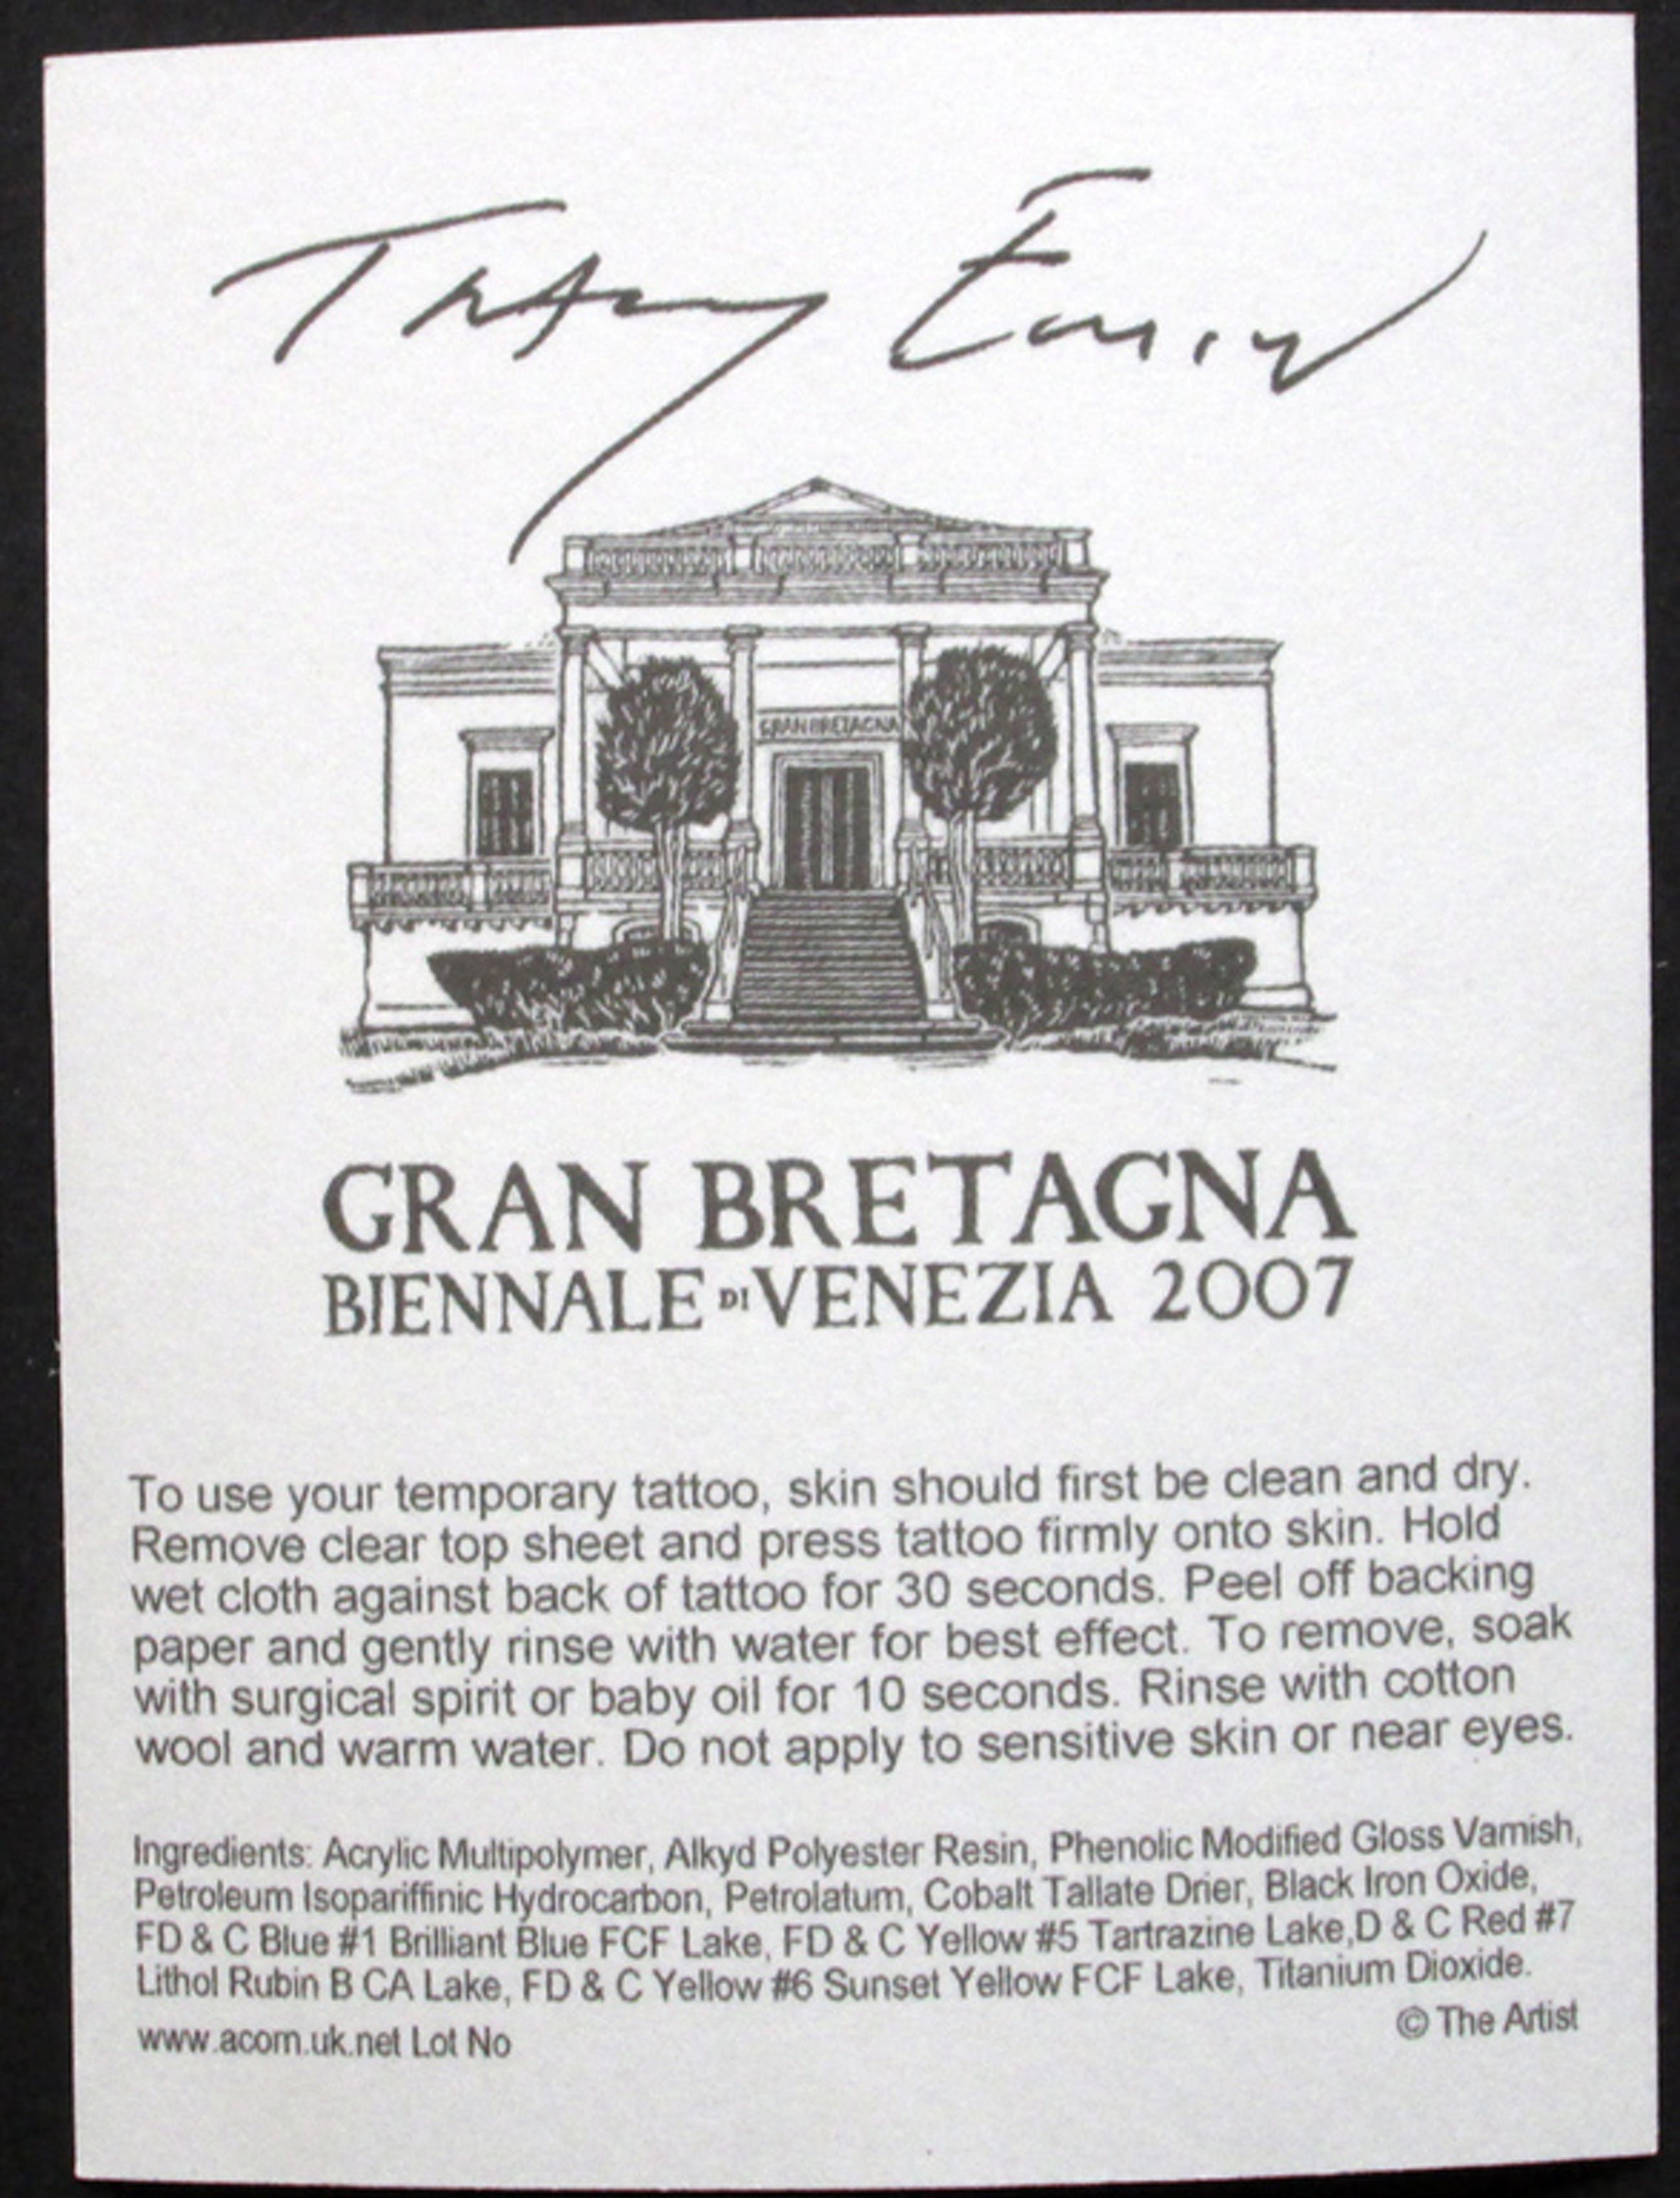 Biennale 2007 - Singing Bird - Tracey Emin, in passe-partout - ready to frame  kopen? Bied vanaf 28!